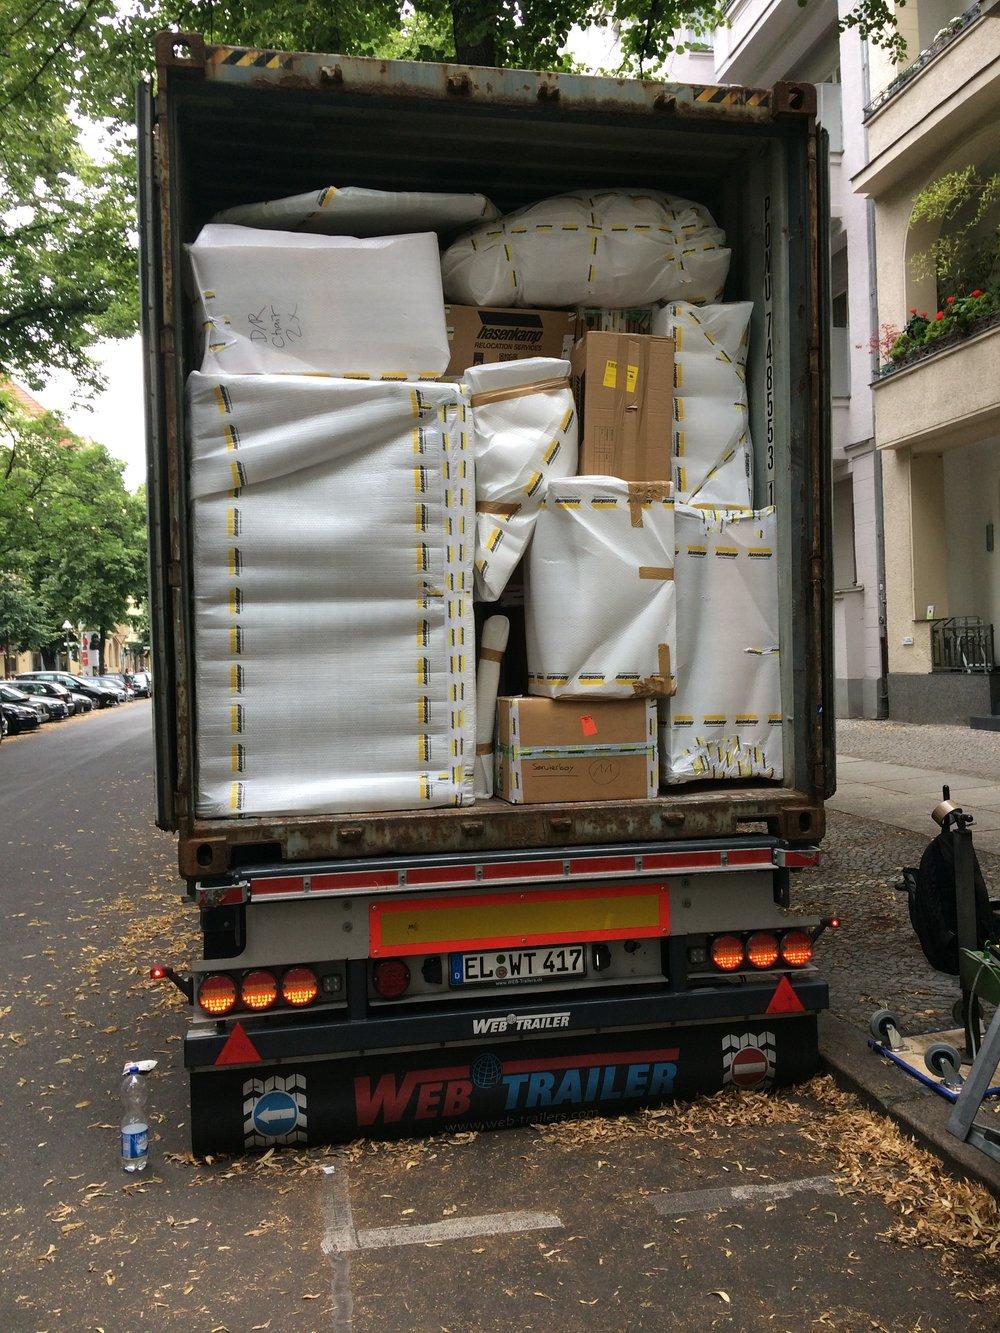 Tschüssi<a href=/kolumnen-berlin/2018/10/7/tschssi>Mehr →</a>